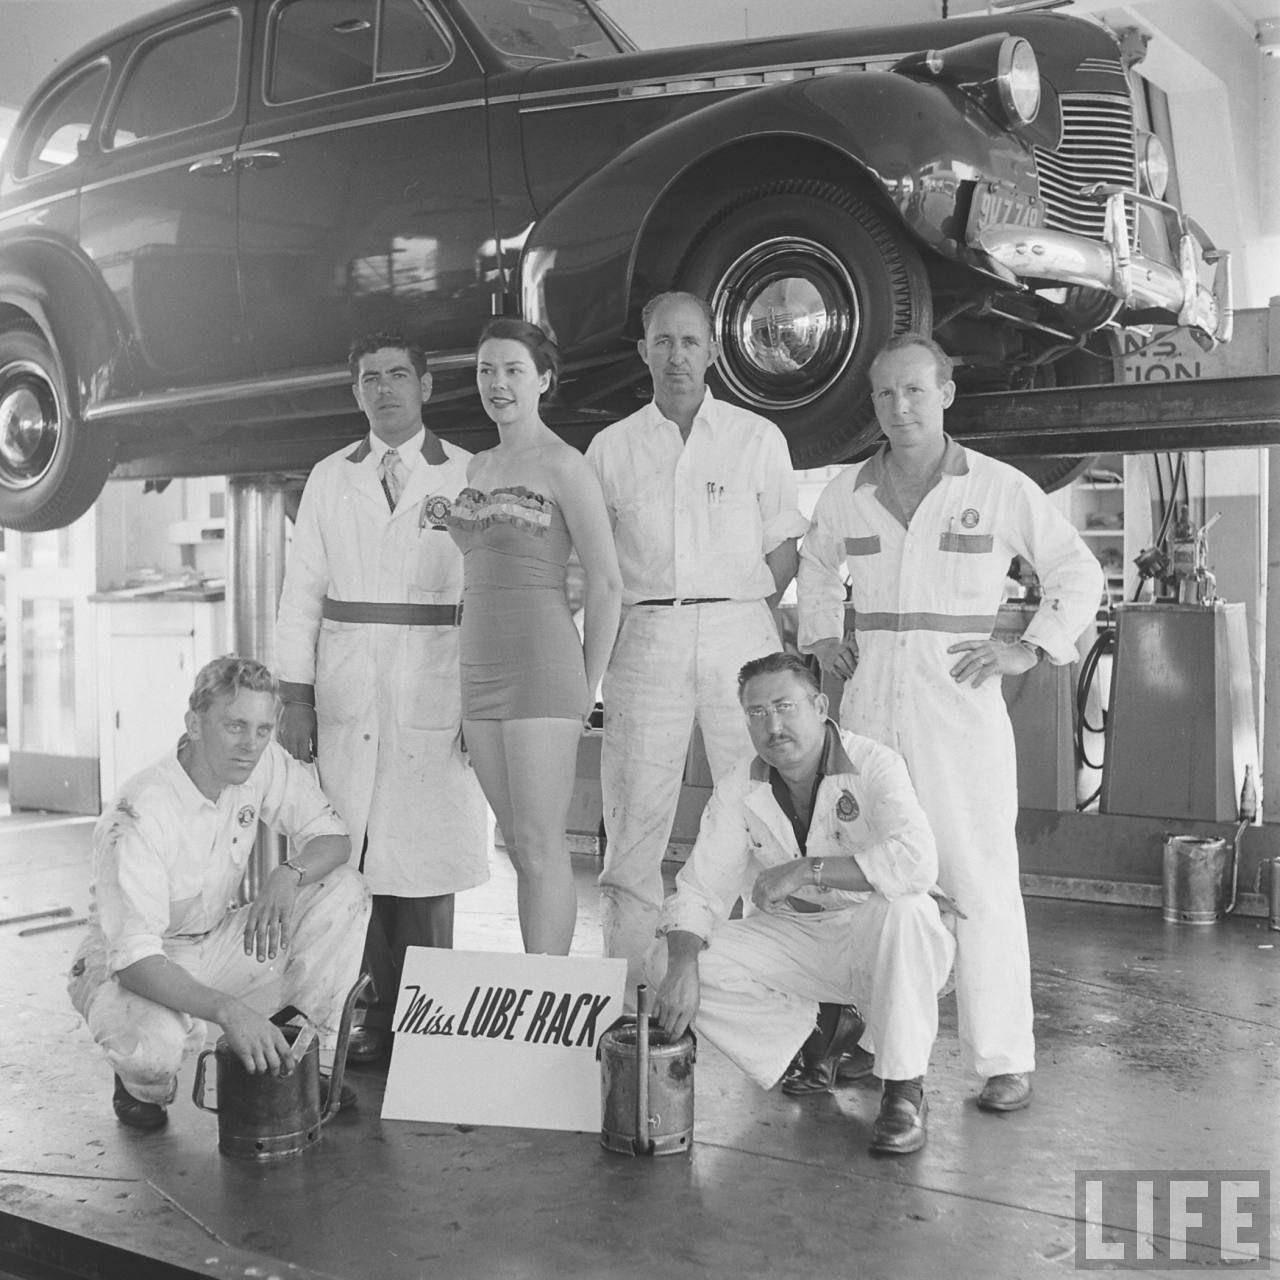 miss lube rack 1950s life magazine